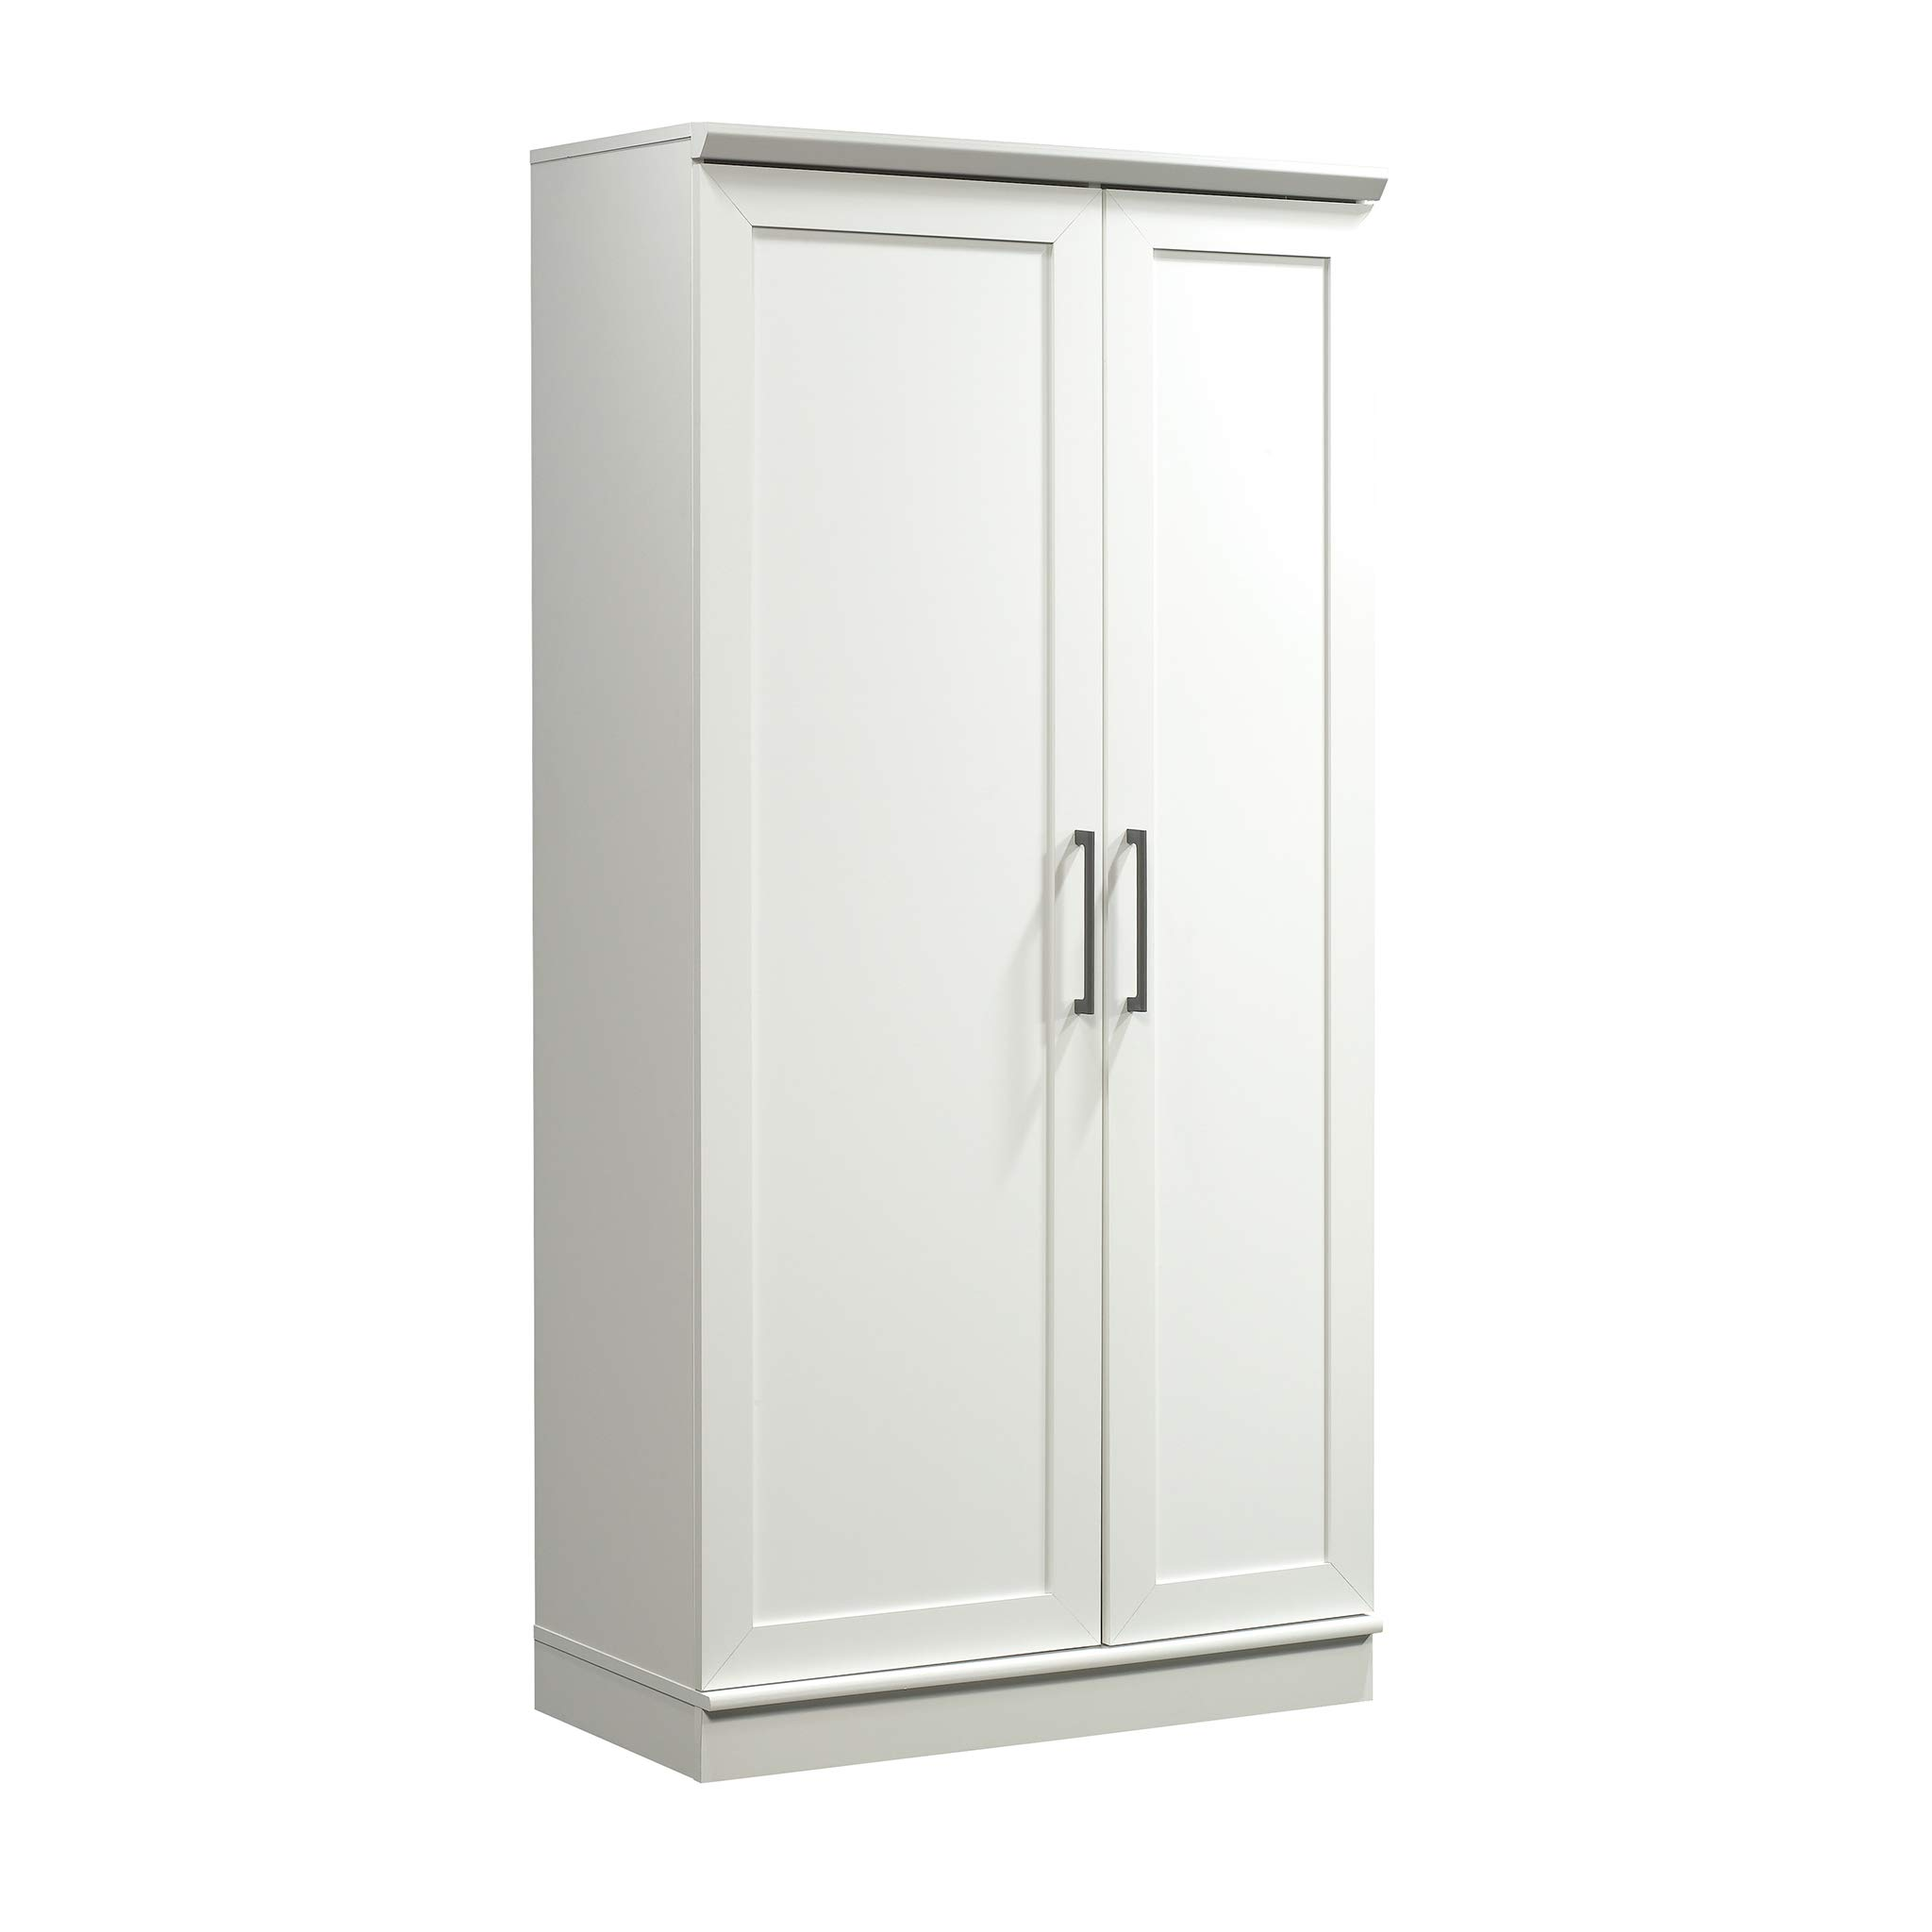 Sauder Cabinet Adjustable Shelves Storage Organizer Soft ...